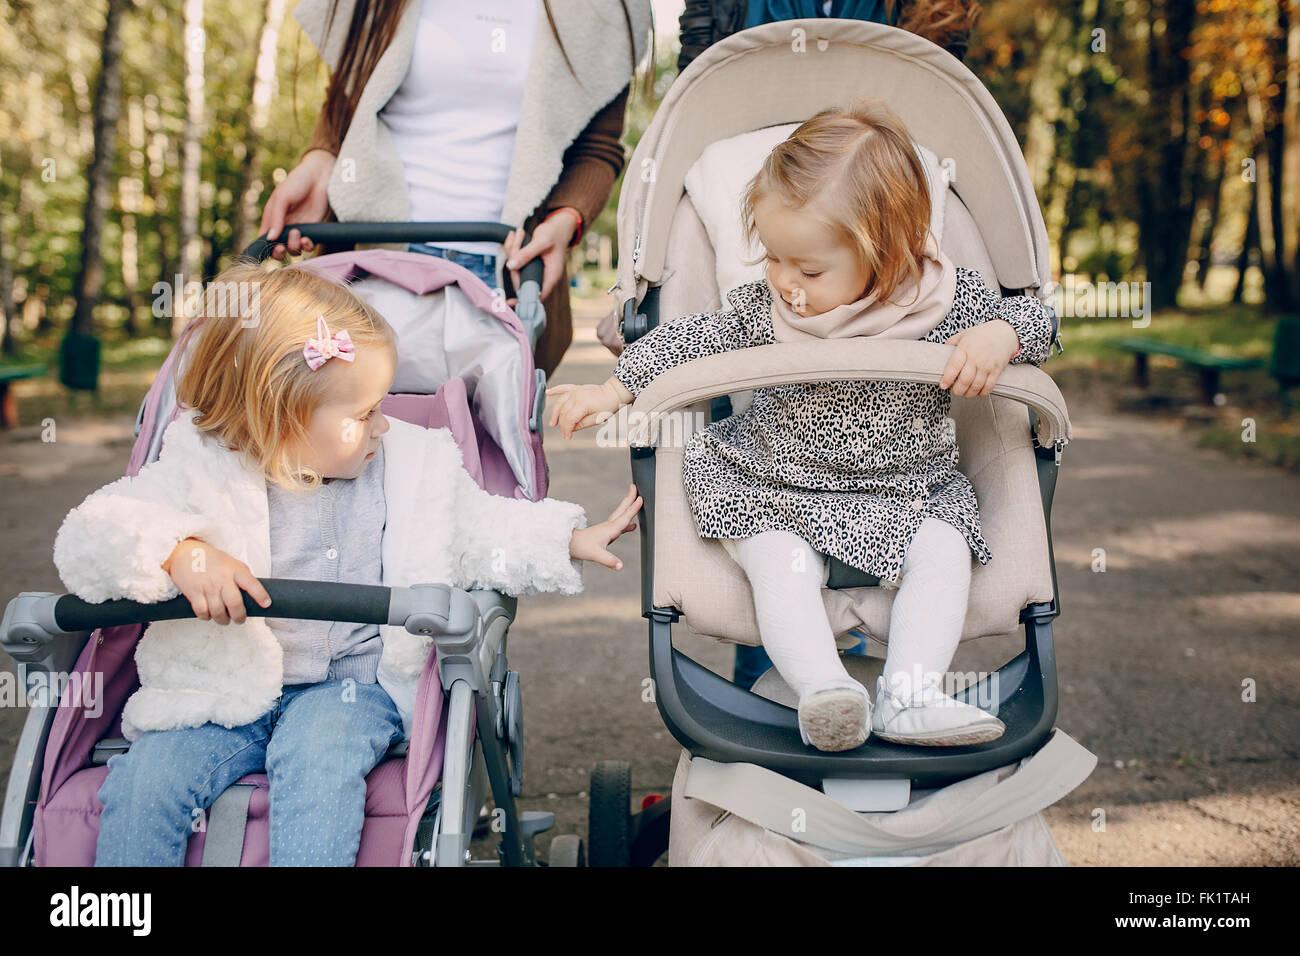 Family walk in the park - Stock Image